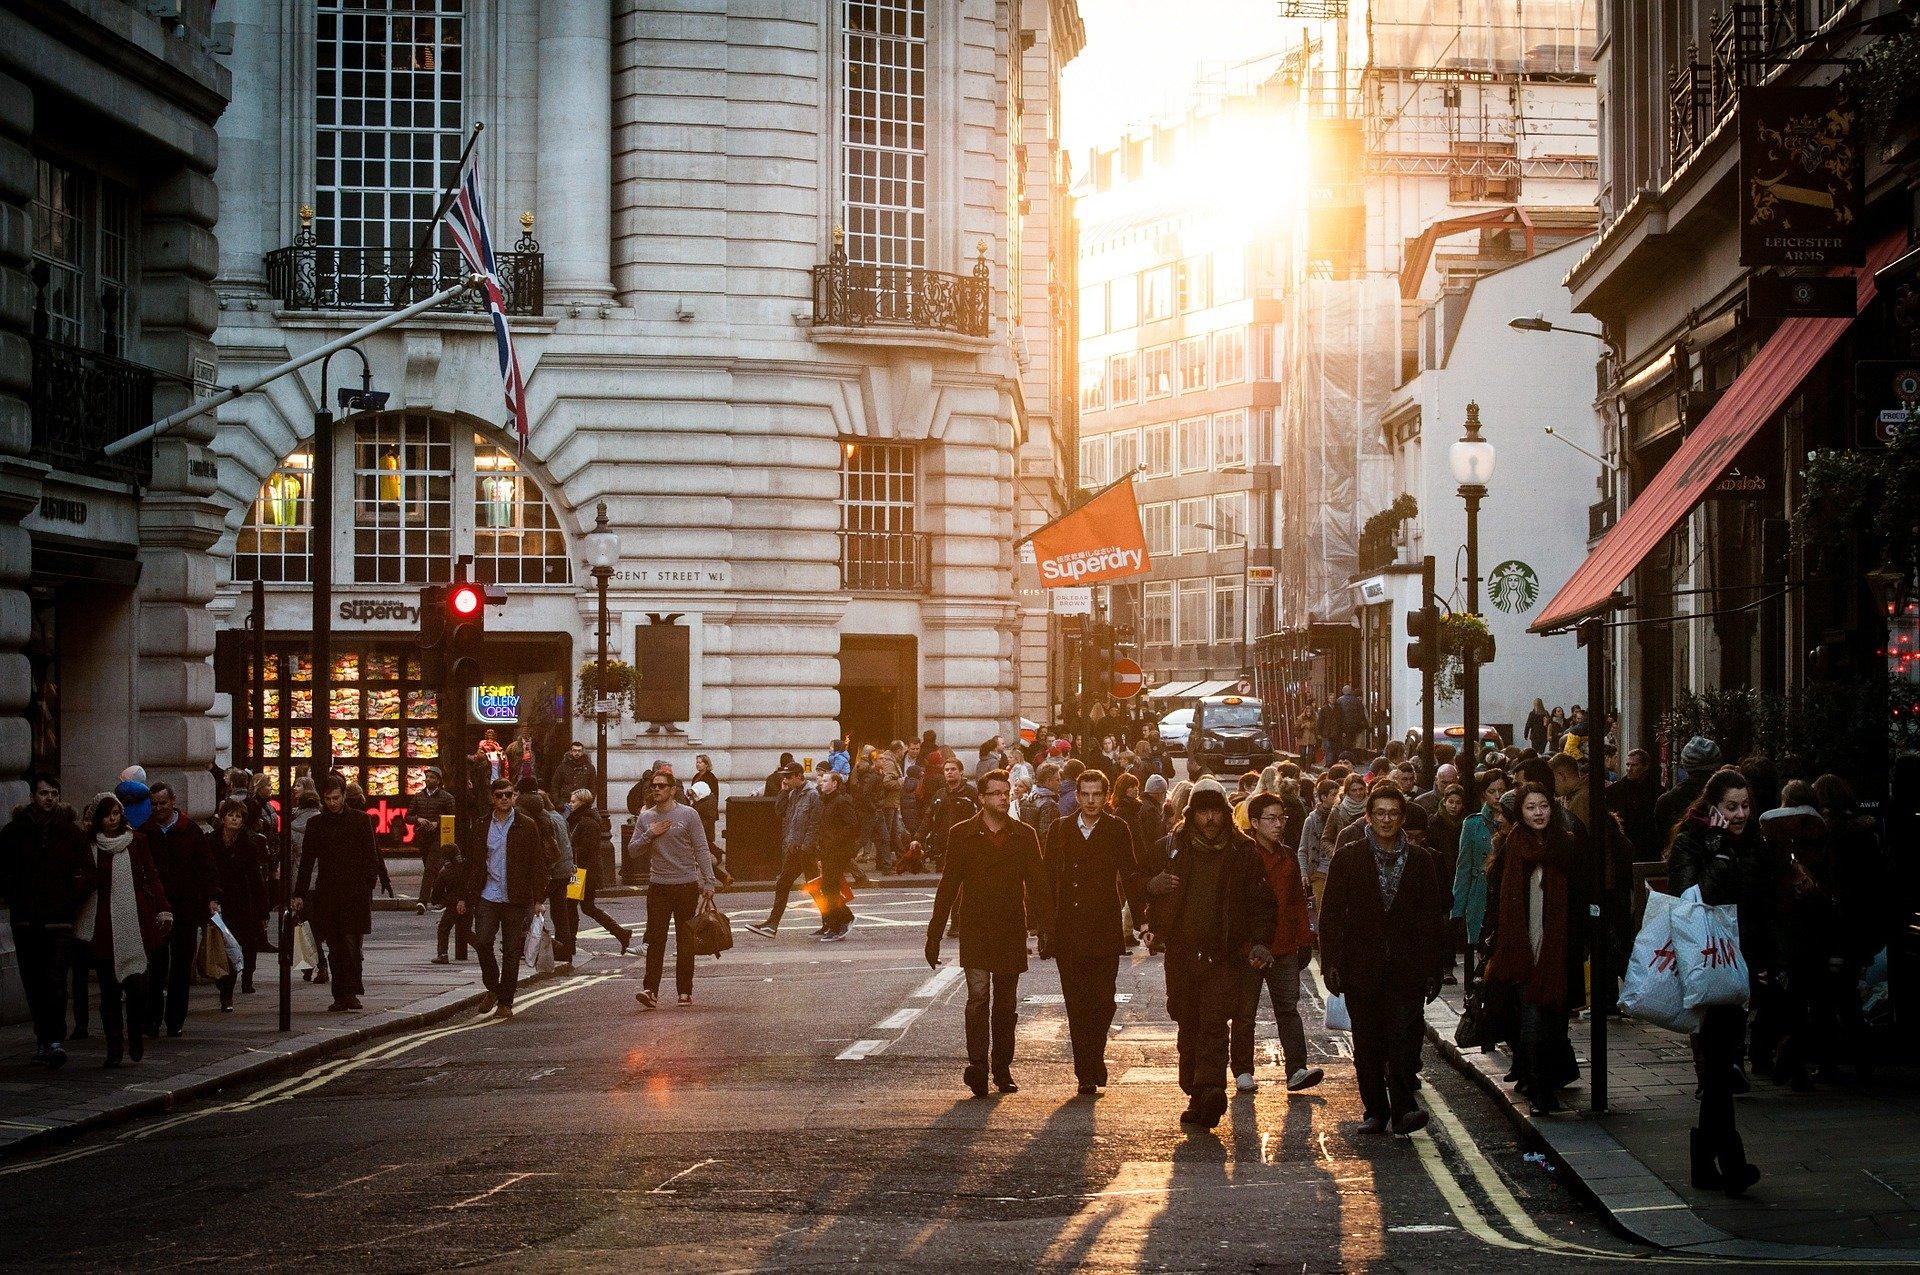 street scene in London